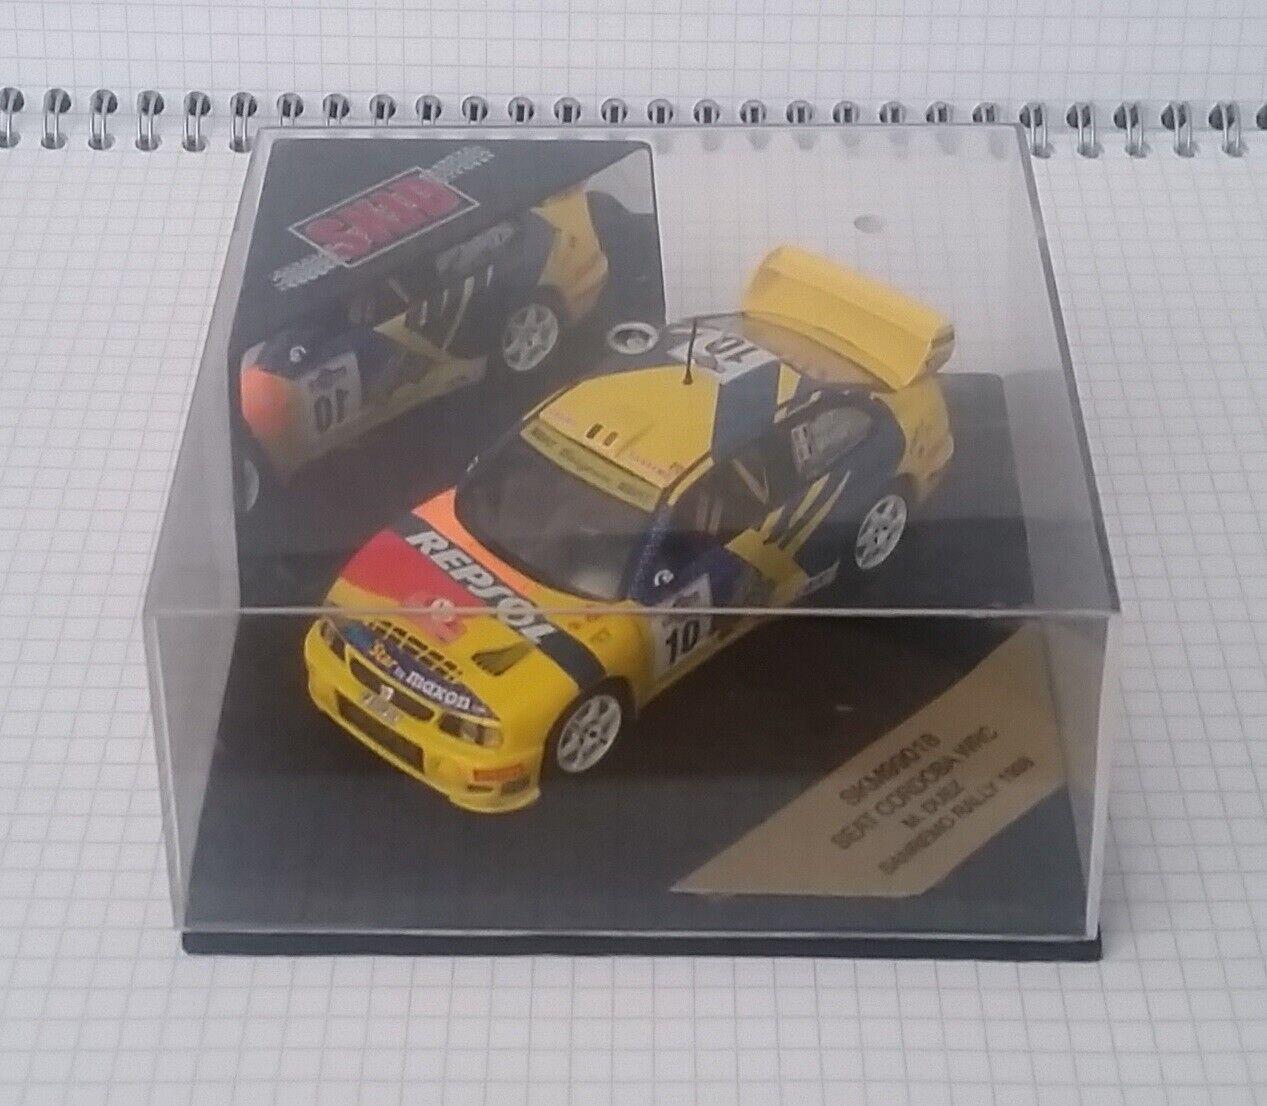 Skid SKM99018 Seat Cordoba WRC Sanremo Rally 1998 Marc Duez 1:43 Mint in Box